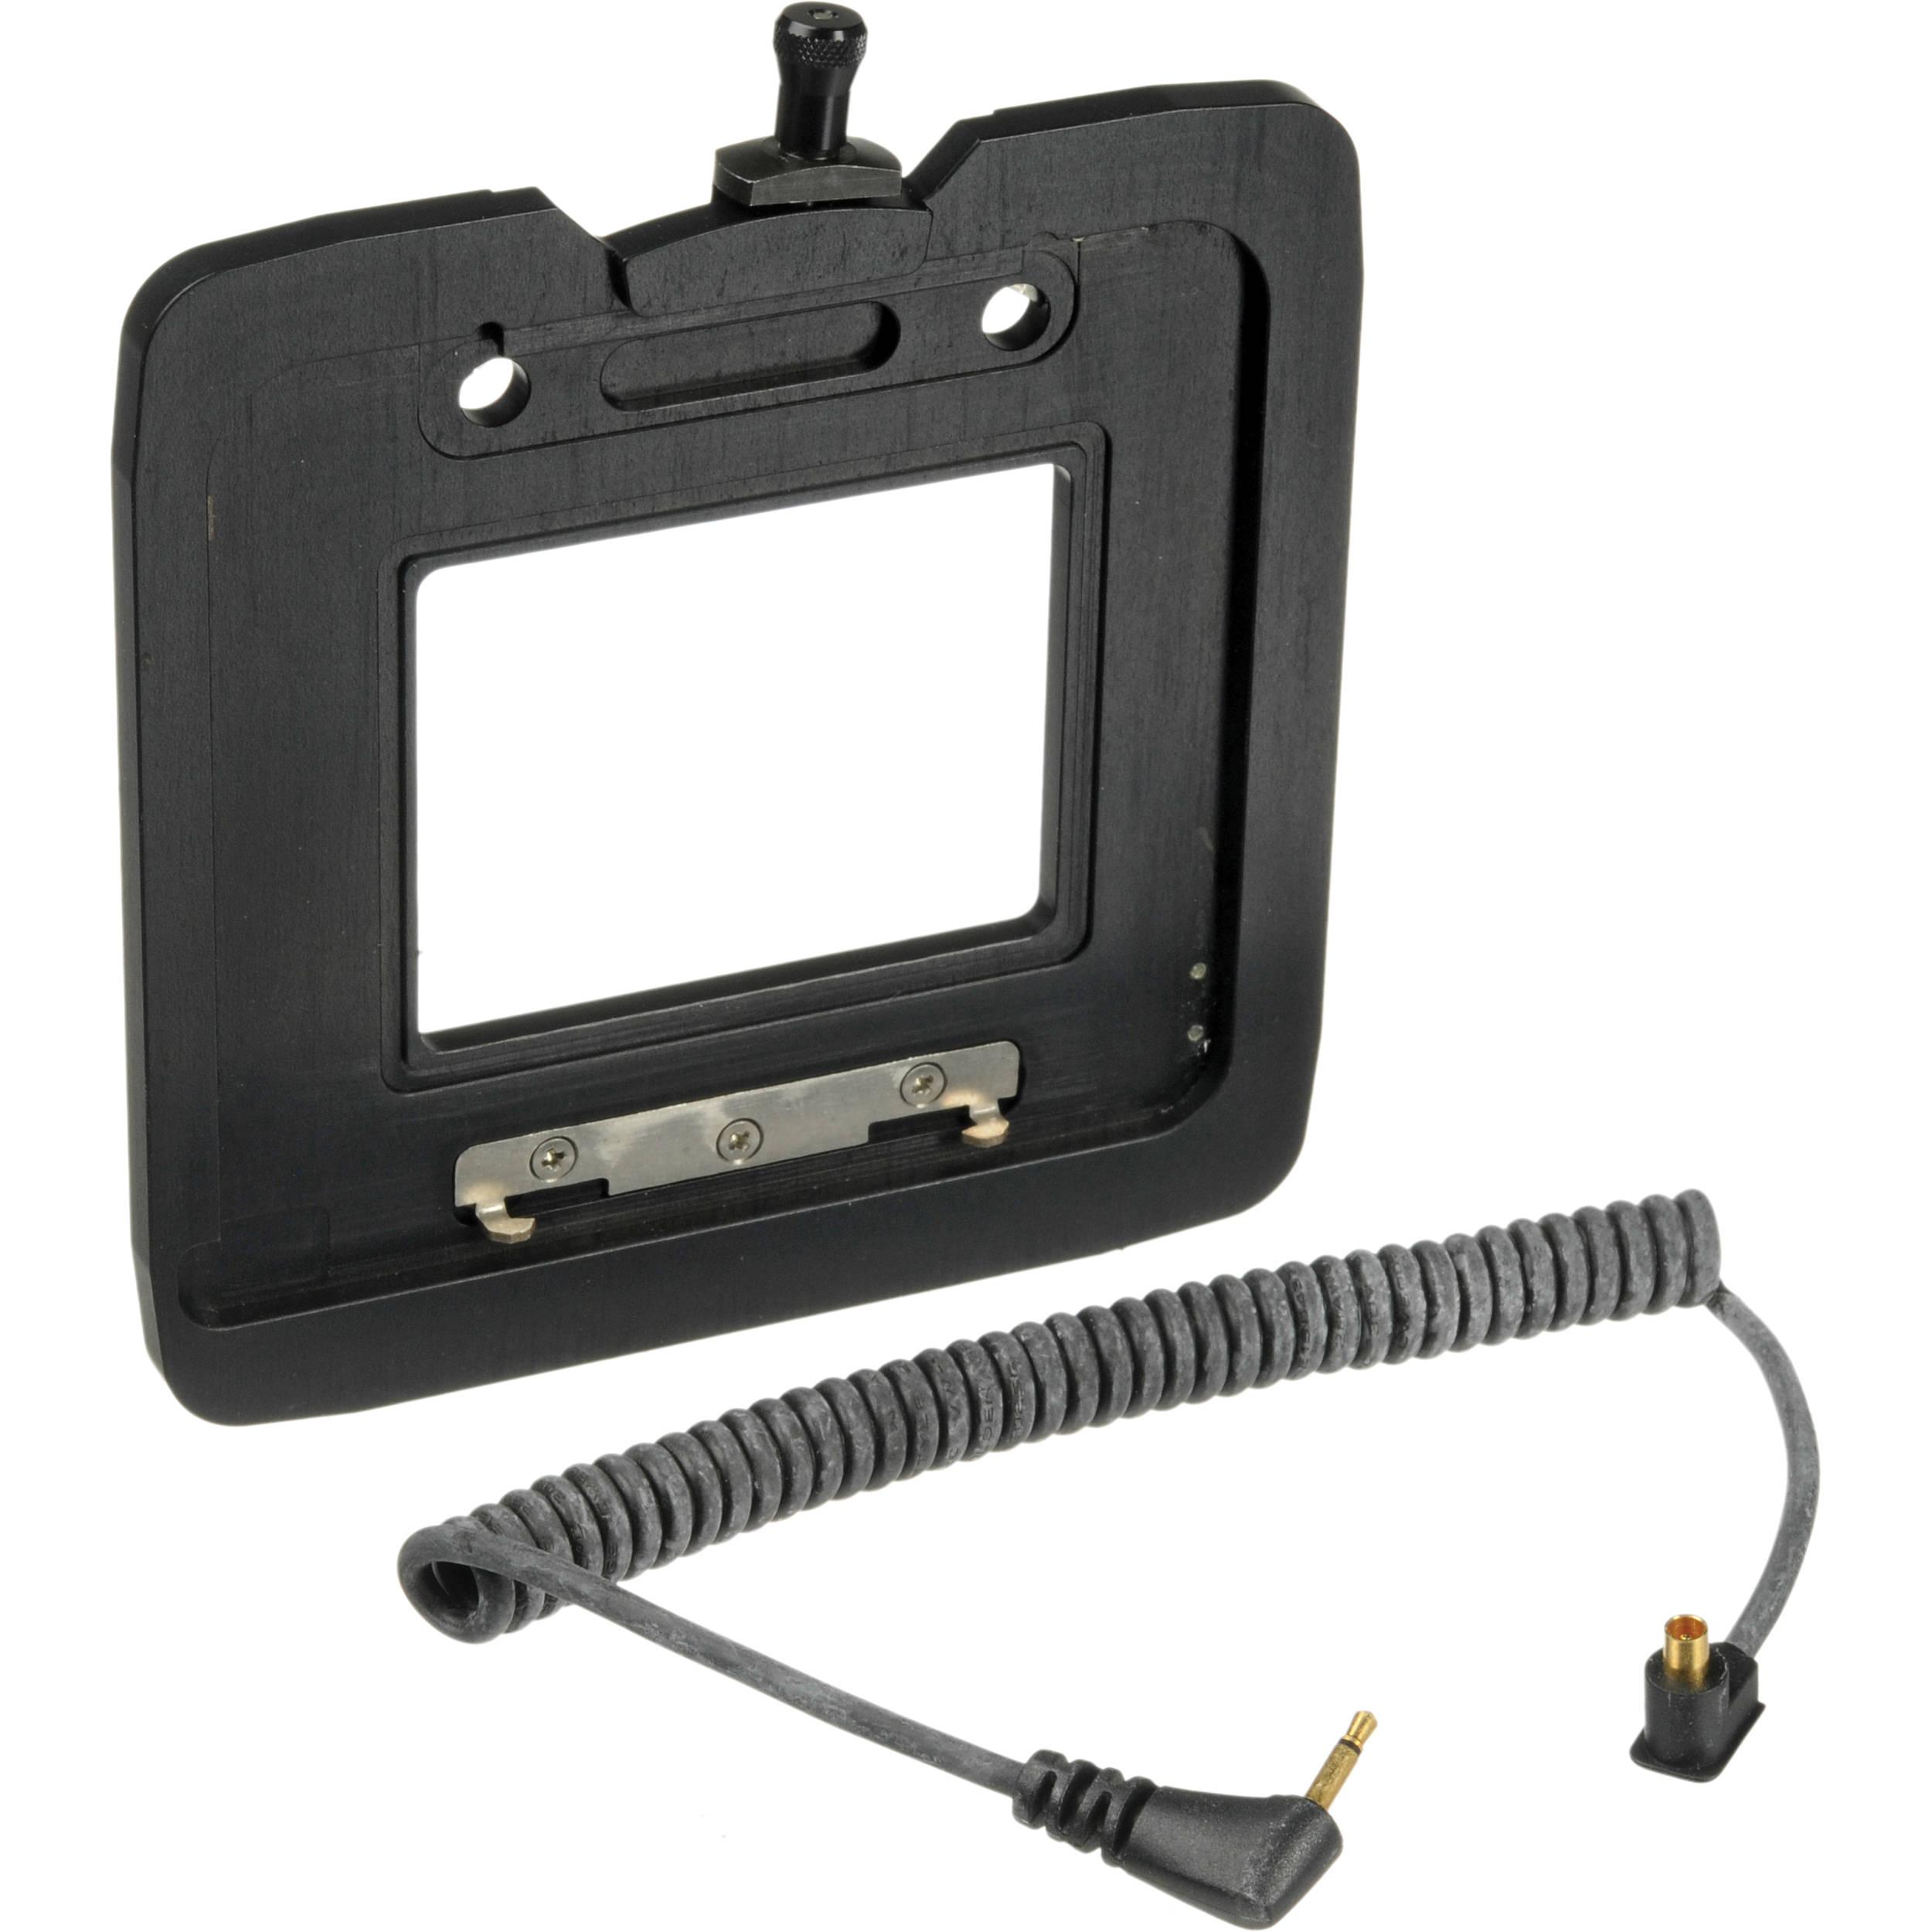 Mamiya RZ67 Pro, Pro II Adapter Kit for DM28 / DM40 Digital Back